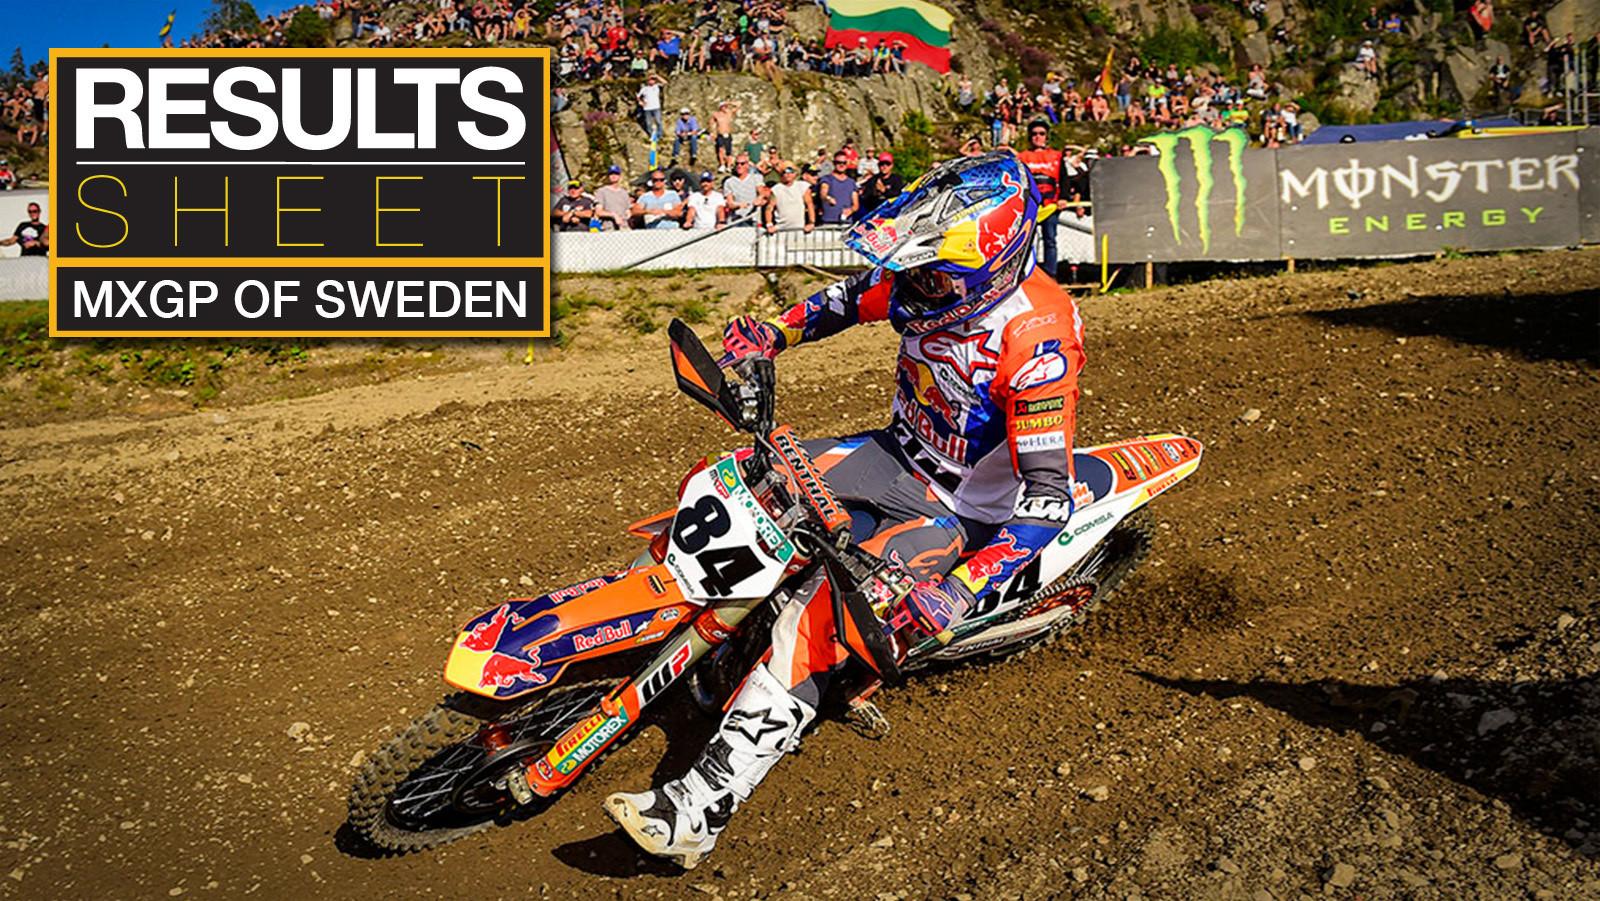 Results Sheet: 2019 MXGP of Sweden